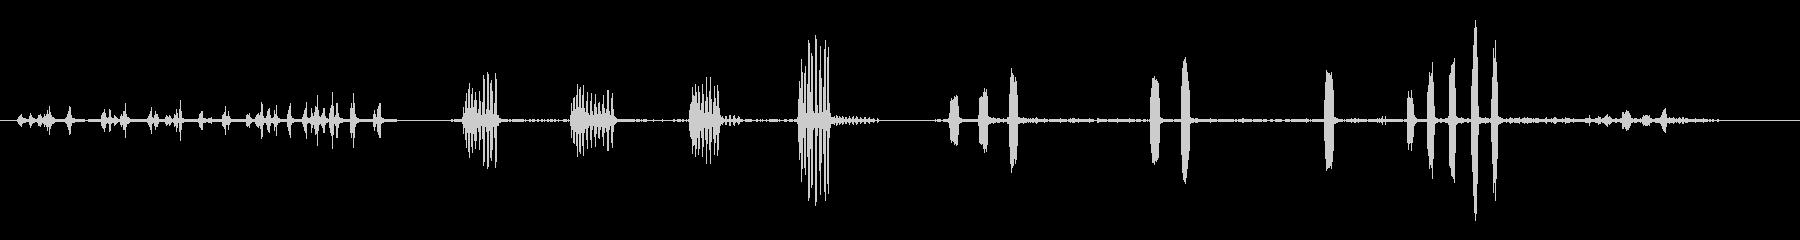 URRACA-カラスの未再生の波形